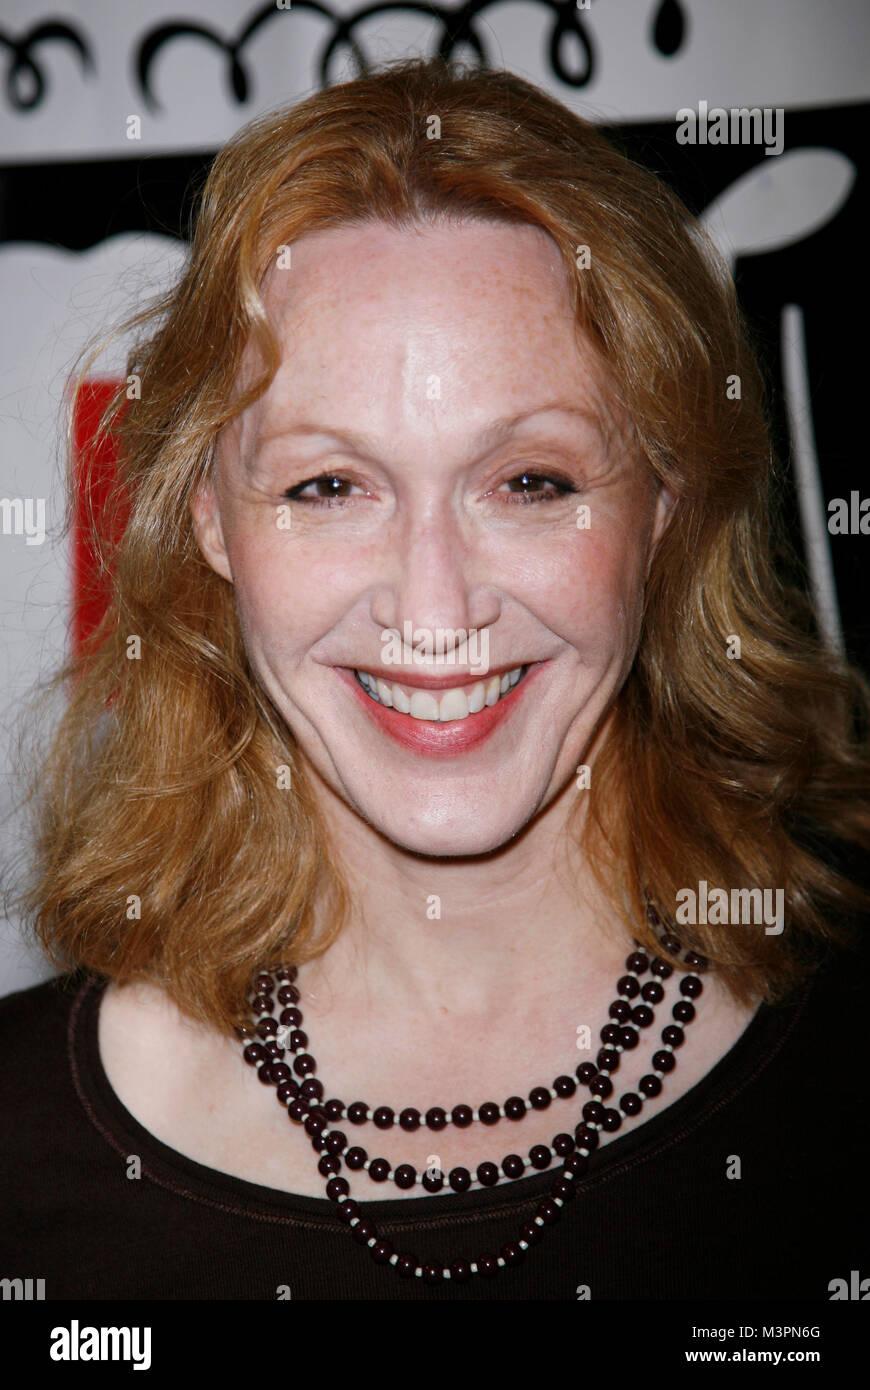 Mara Berni,Tully Jensen Hot video Angeli Nicole Sanoy (b. 2001),Diane Cary